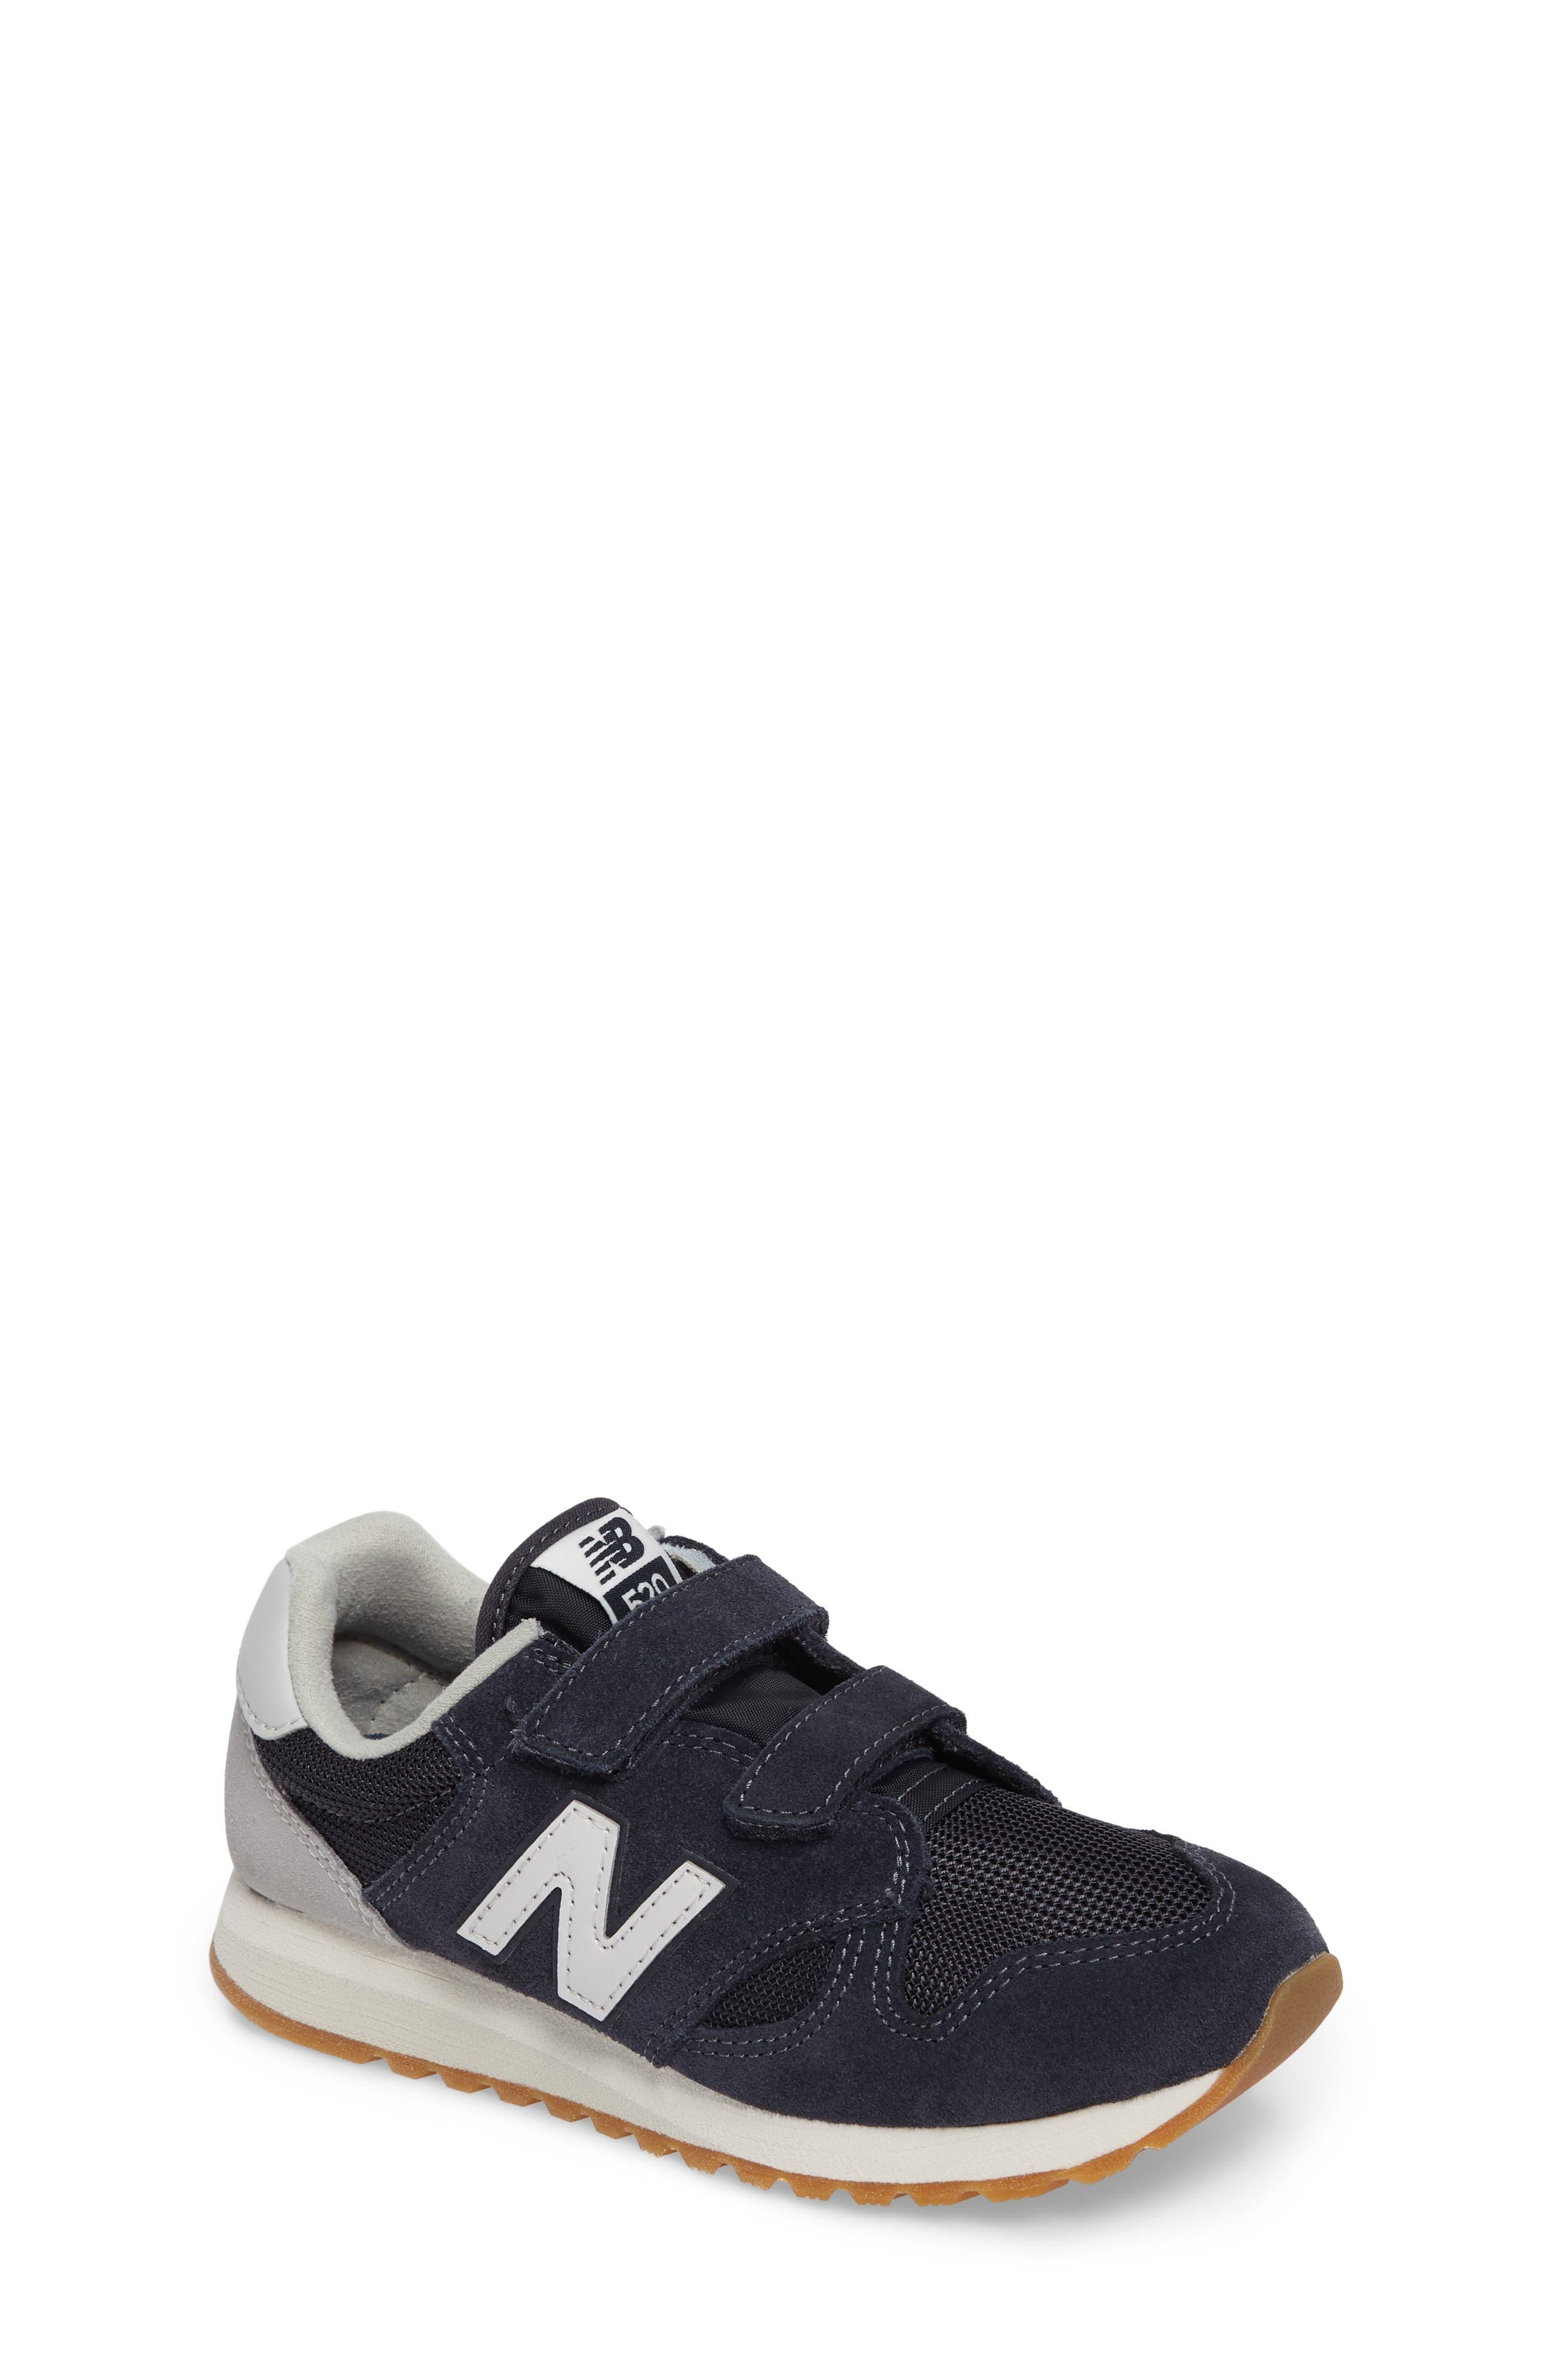 520 Sneaker,                             Main thumbnail 1, color,                             Blue